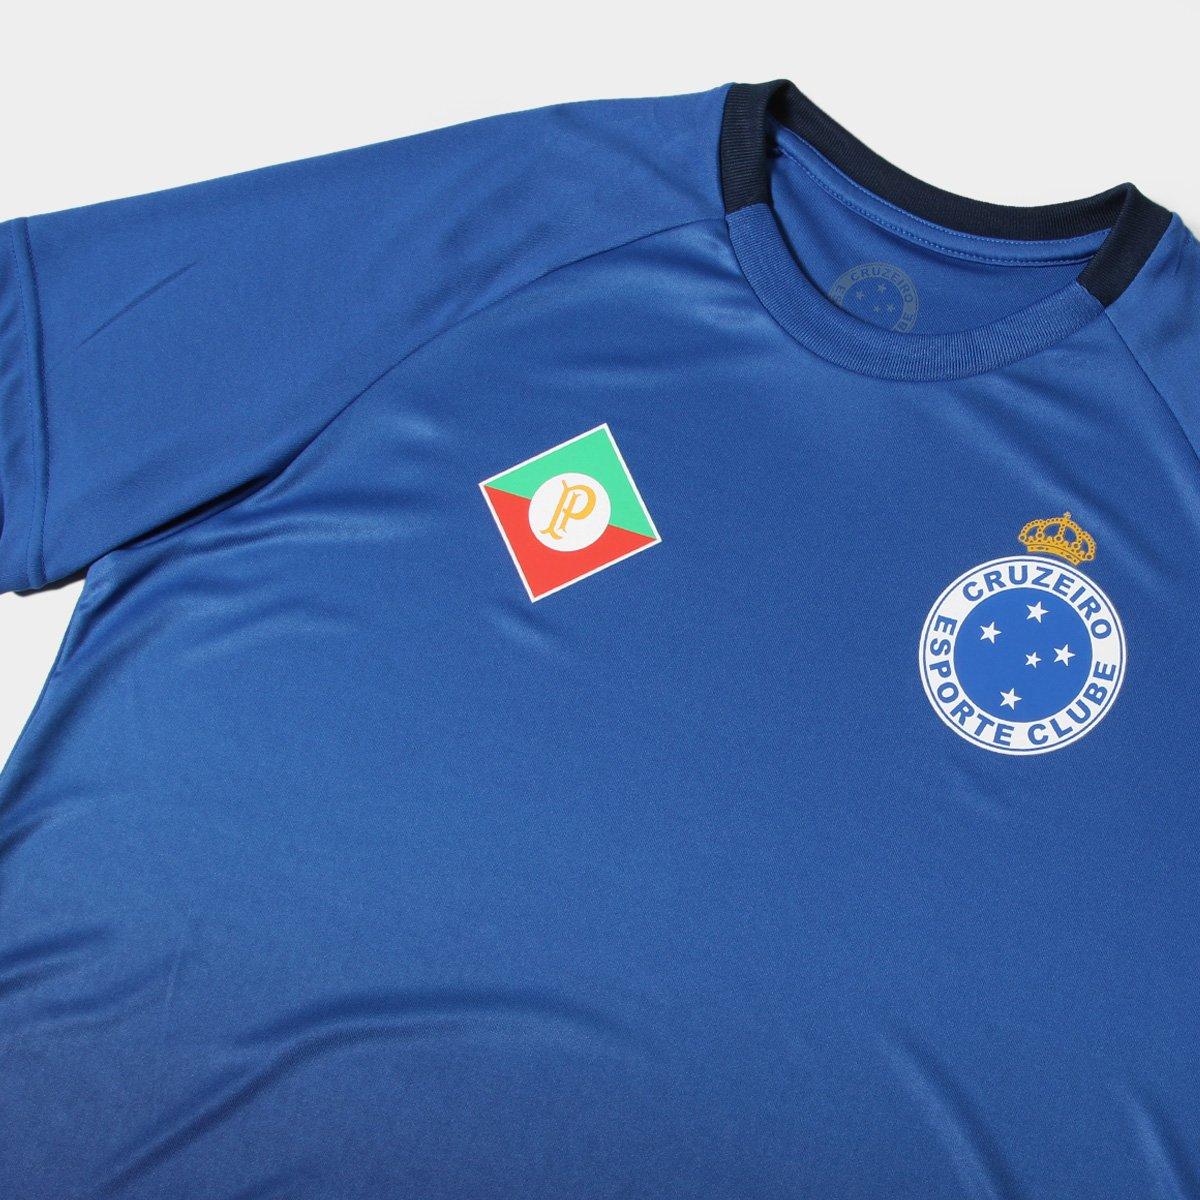 2a3c4b35a8 Camisa Cruzeiro 2009 s nº Masculina - Azul - Compre Agora